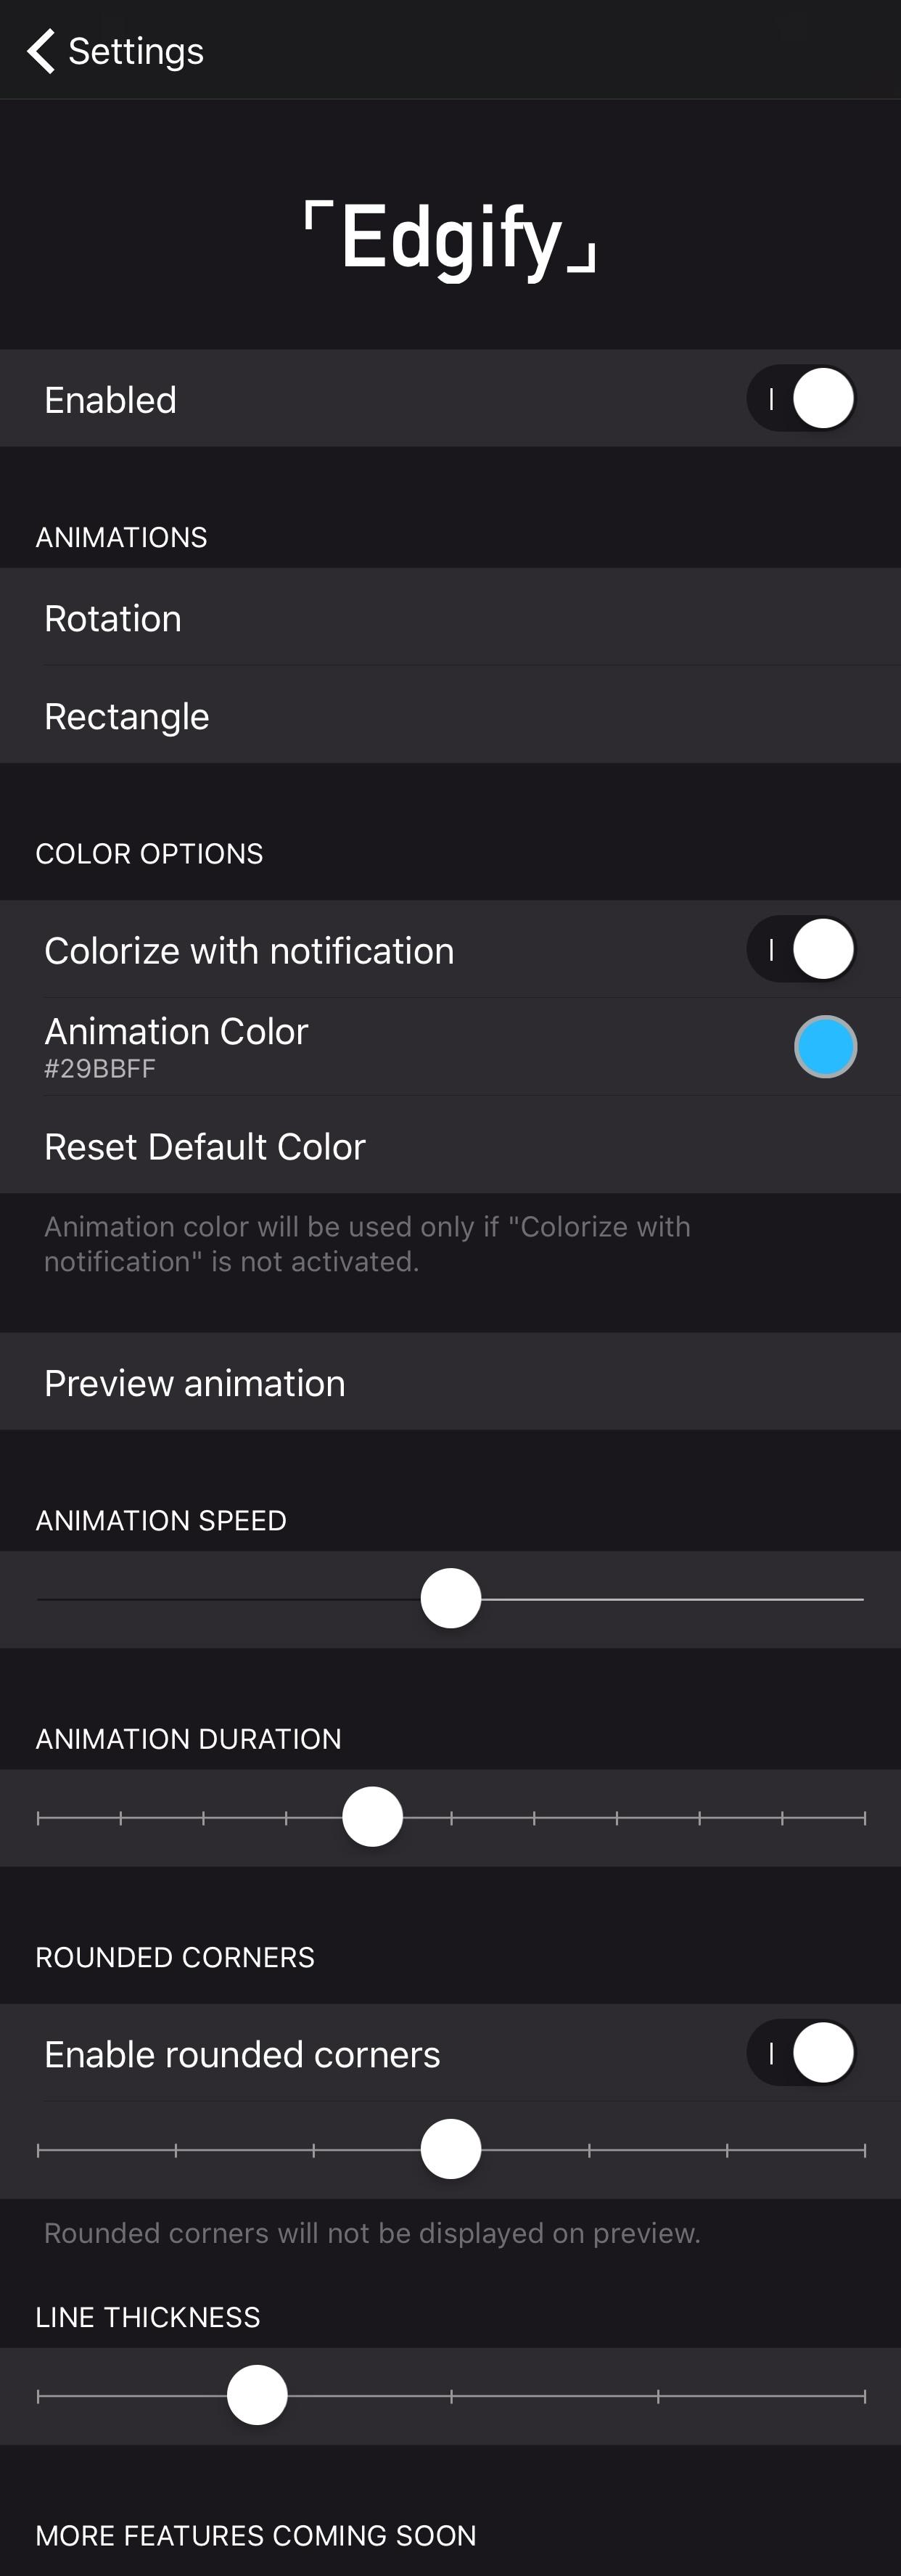 Edgify: another tweak that brings Galaxy S8-inspired notification